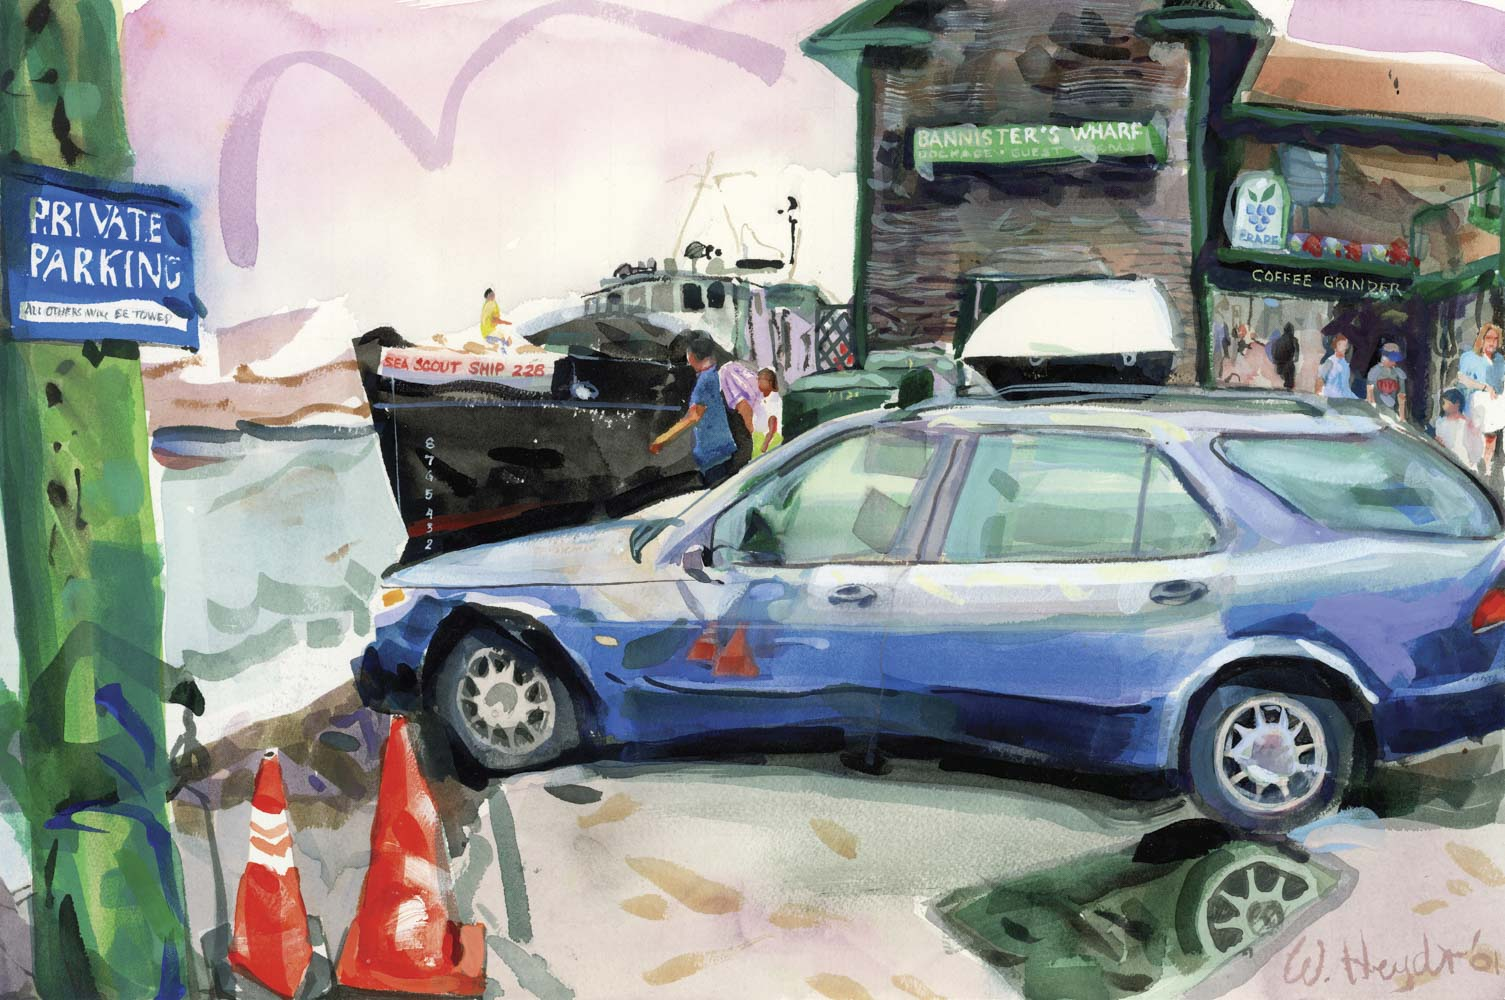 Private Parking, Bowen's Wharf